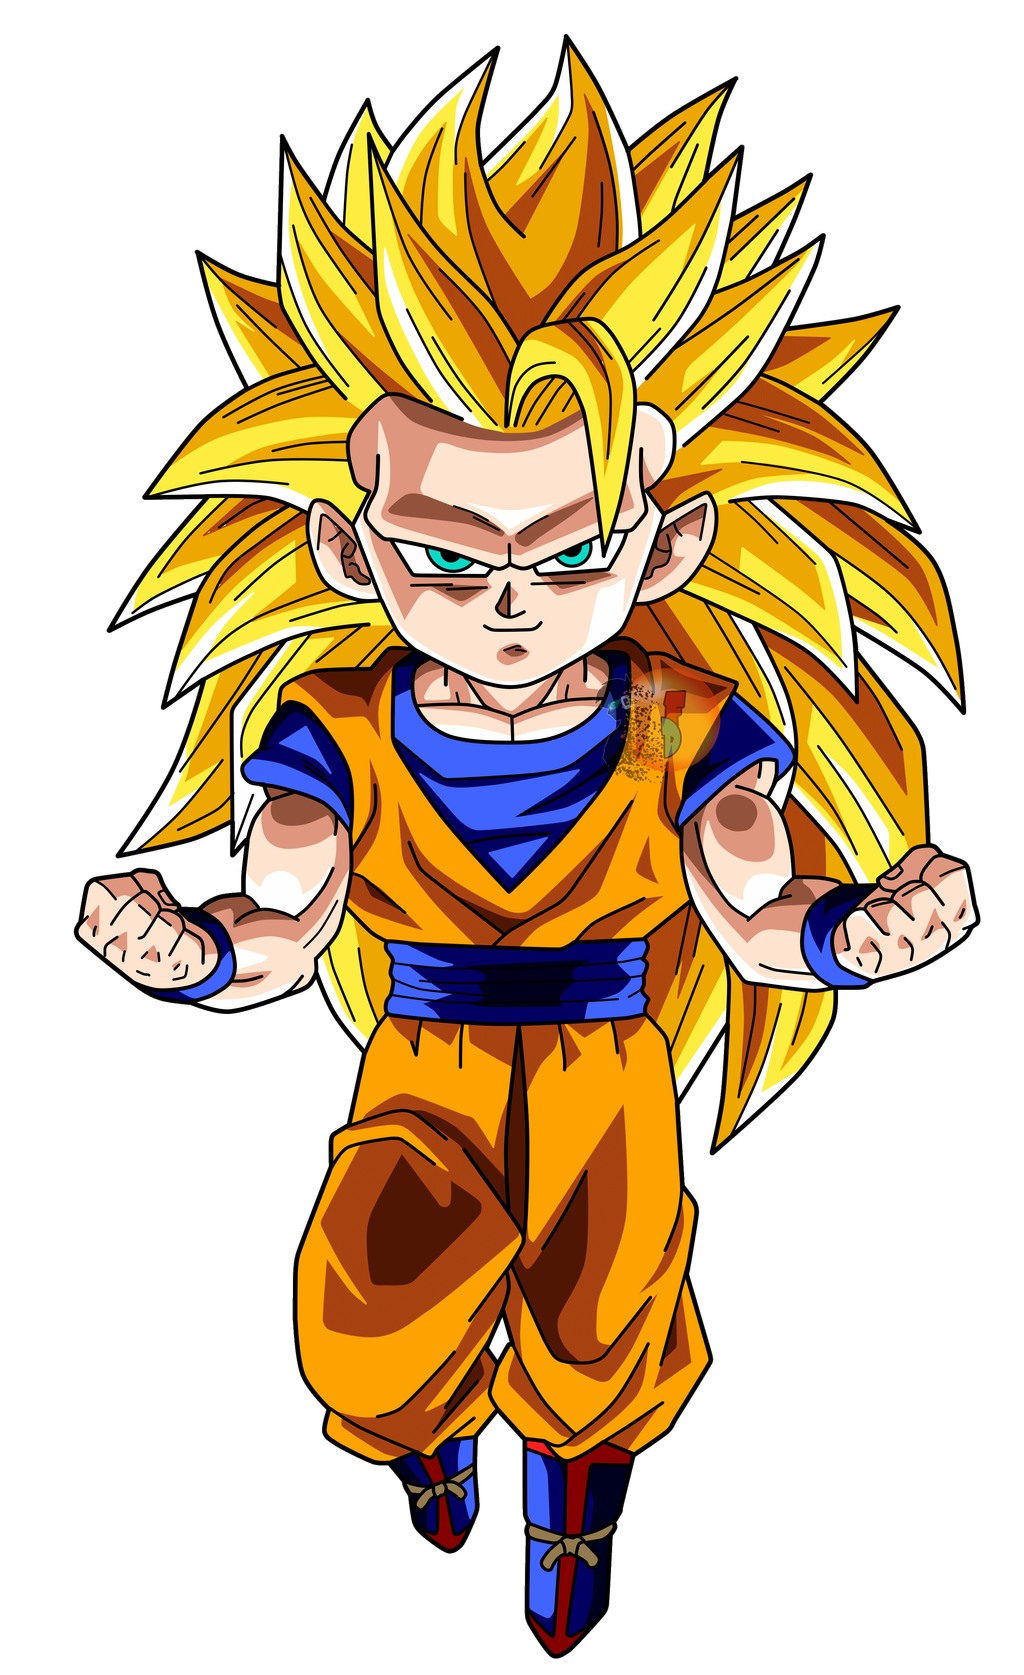 Goku Ssj3 Chibi Facudibuja By Facudibuja On Deviantart Chibi Dragon Dragon Ball Tattoo Anime Dragon Ball Super